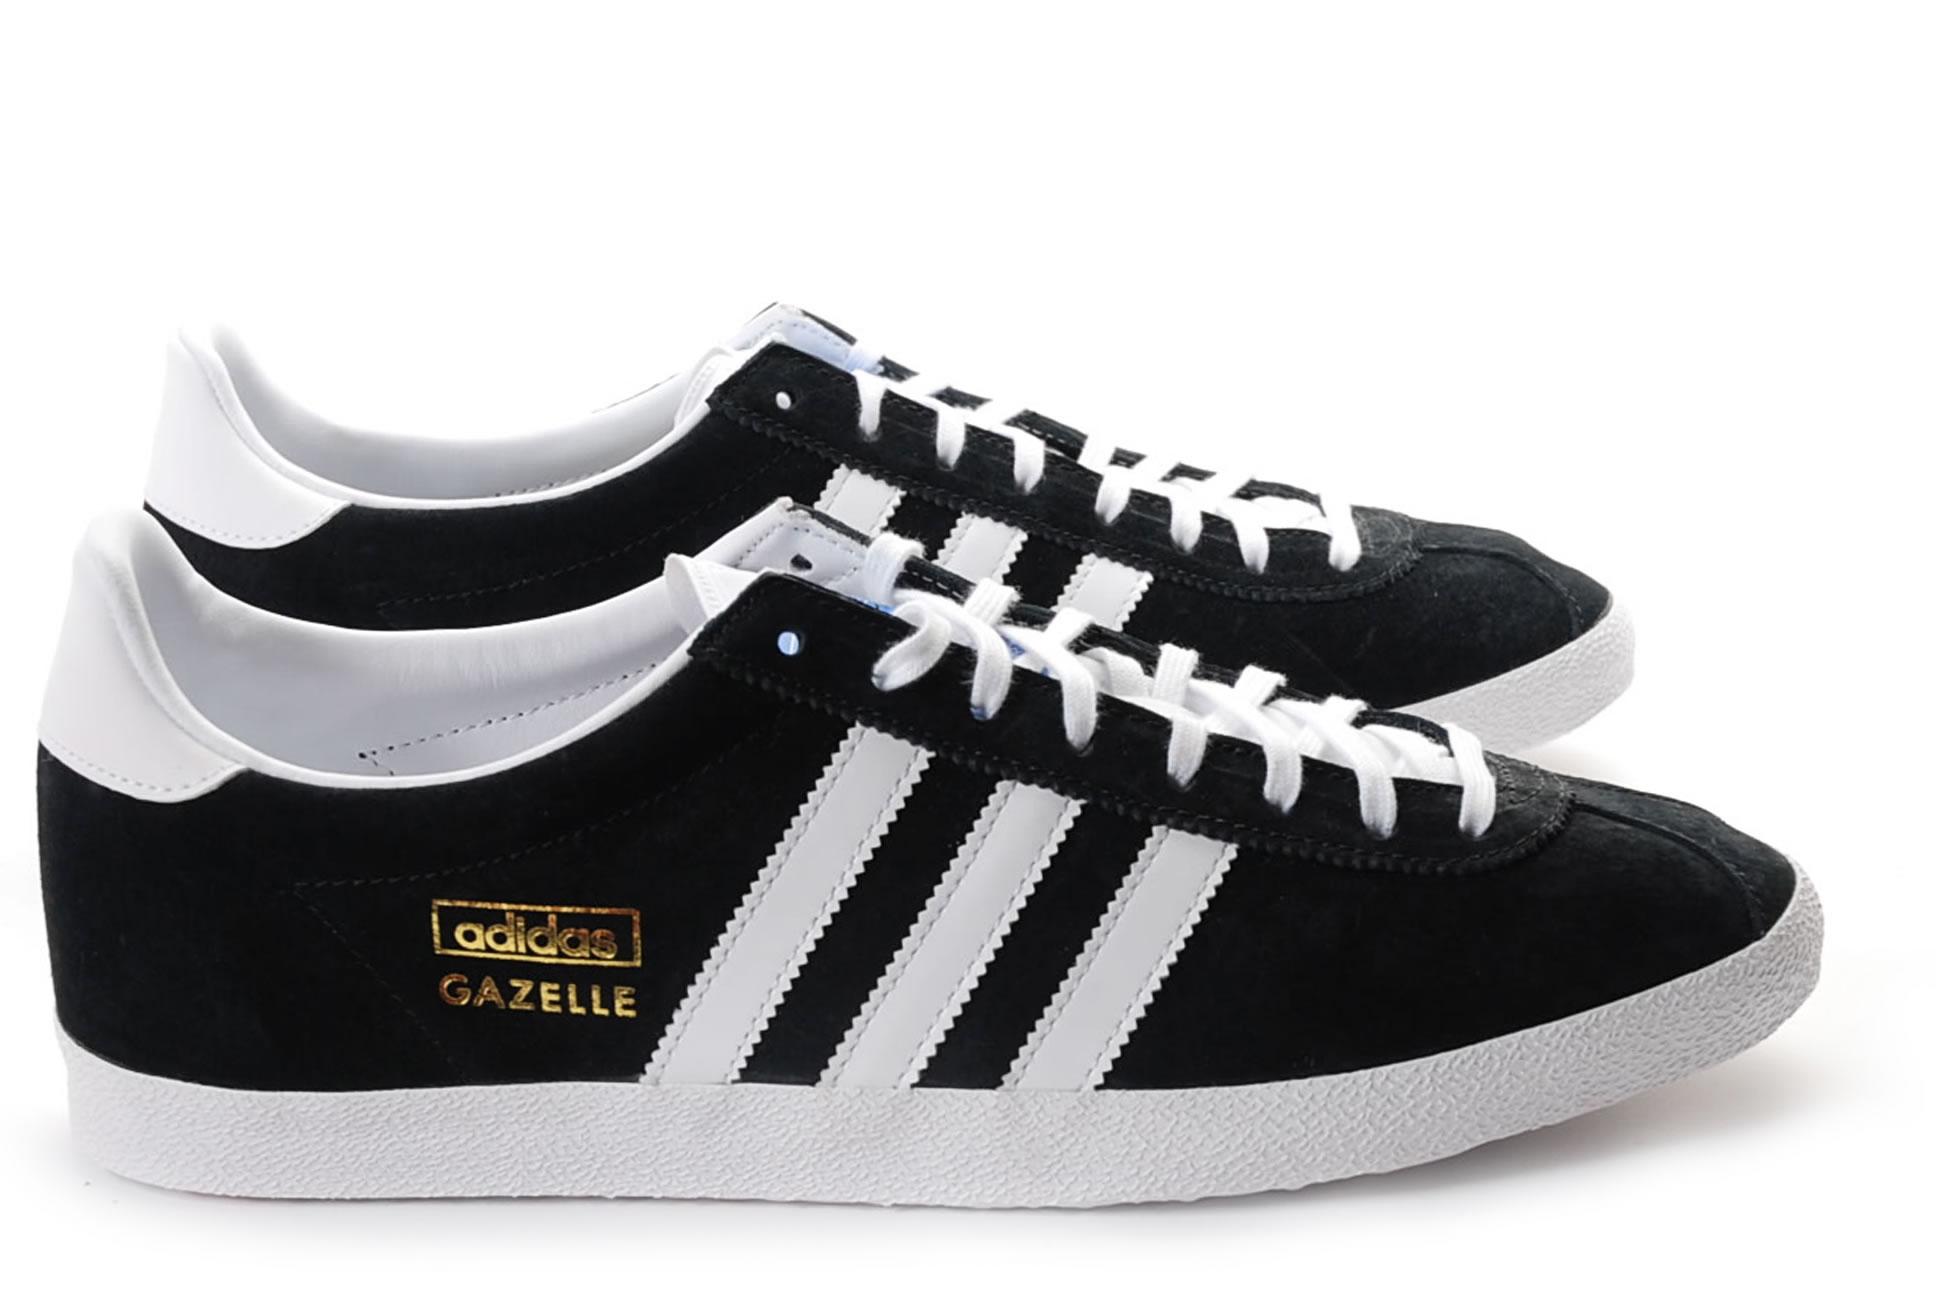 adidas gazelle og noir pas cher,adidas Originals Gazelle Og Baskets basses Mixte Adulte